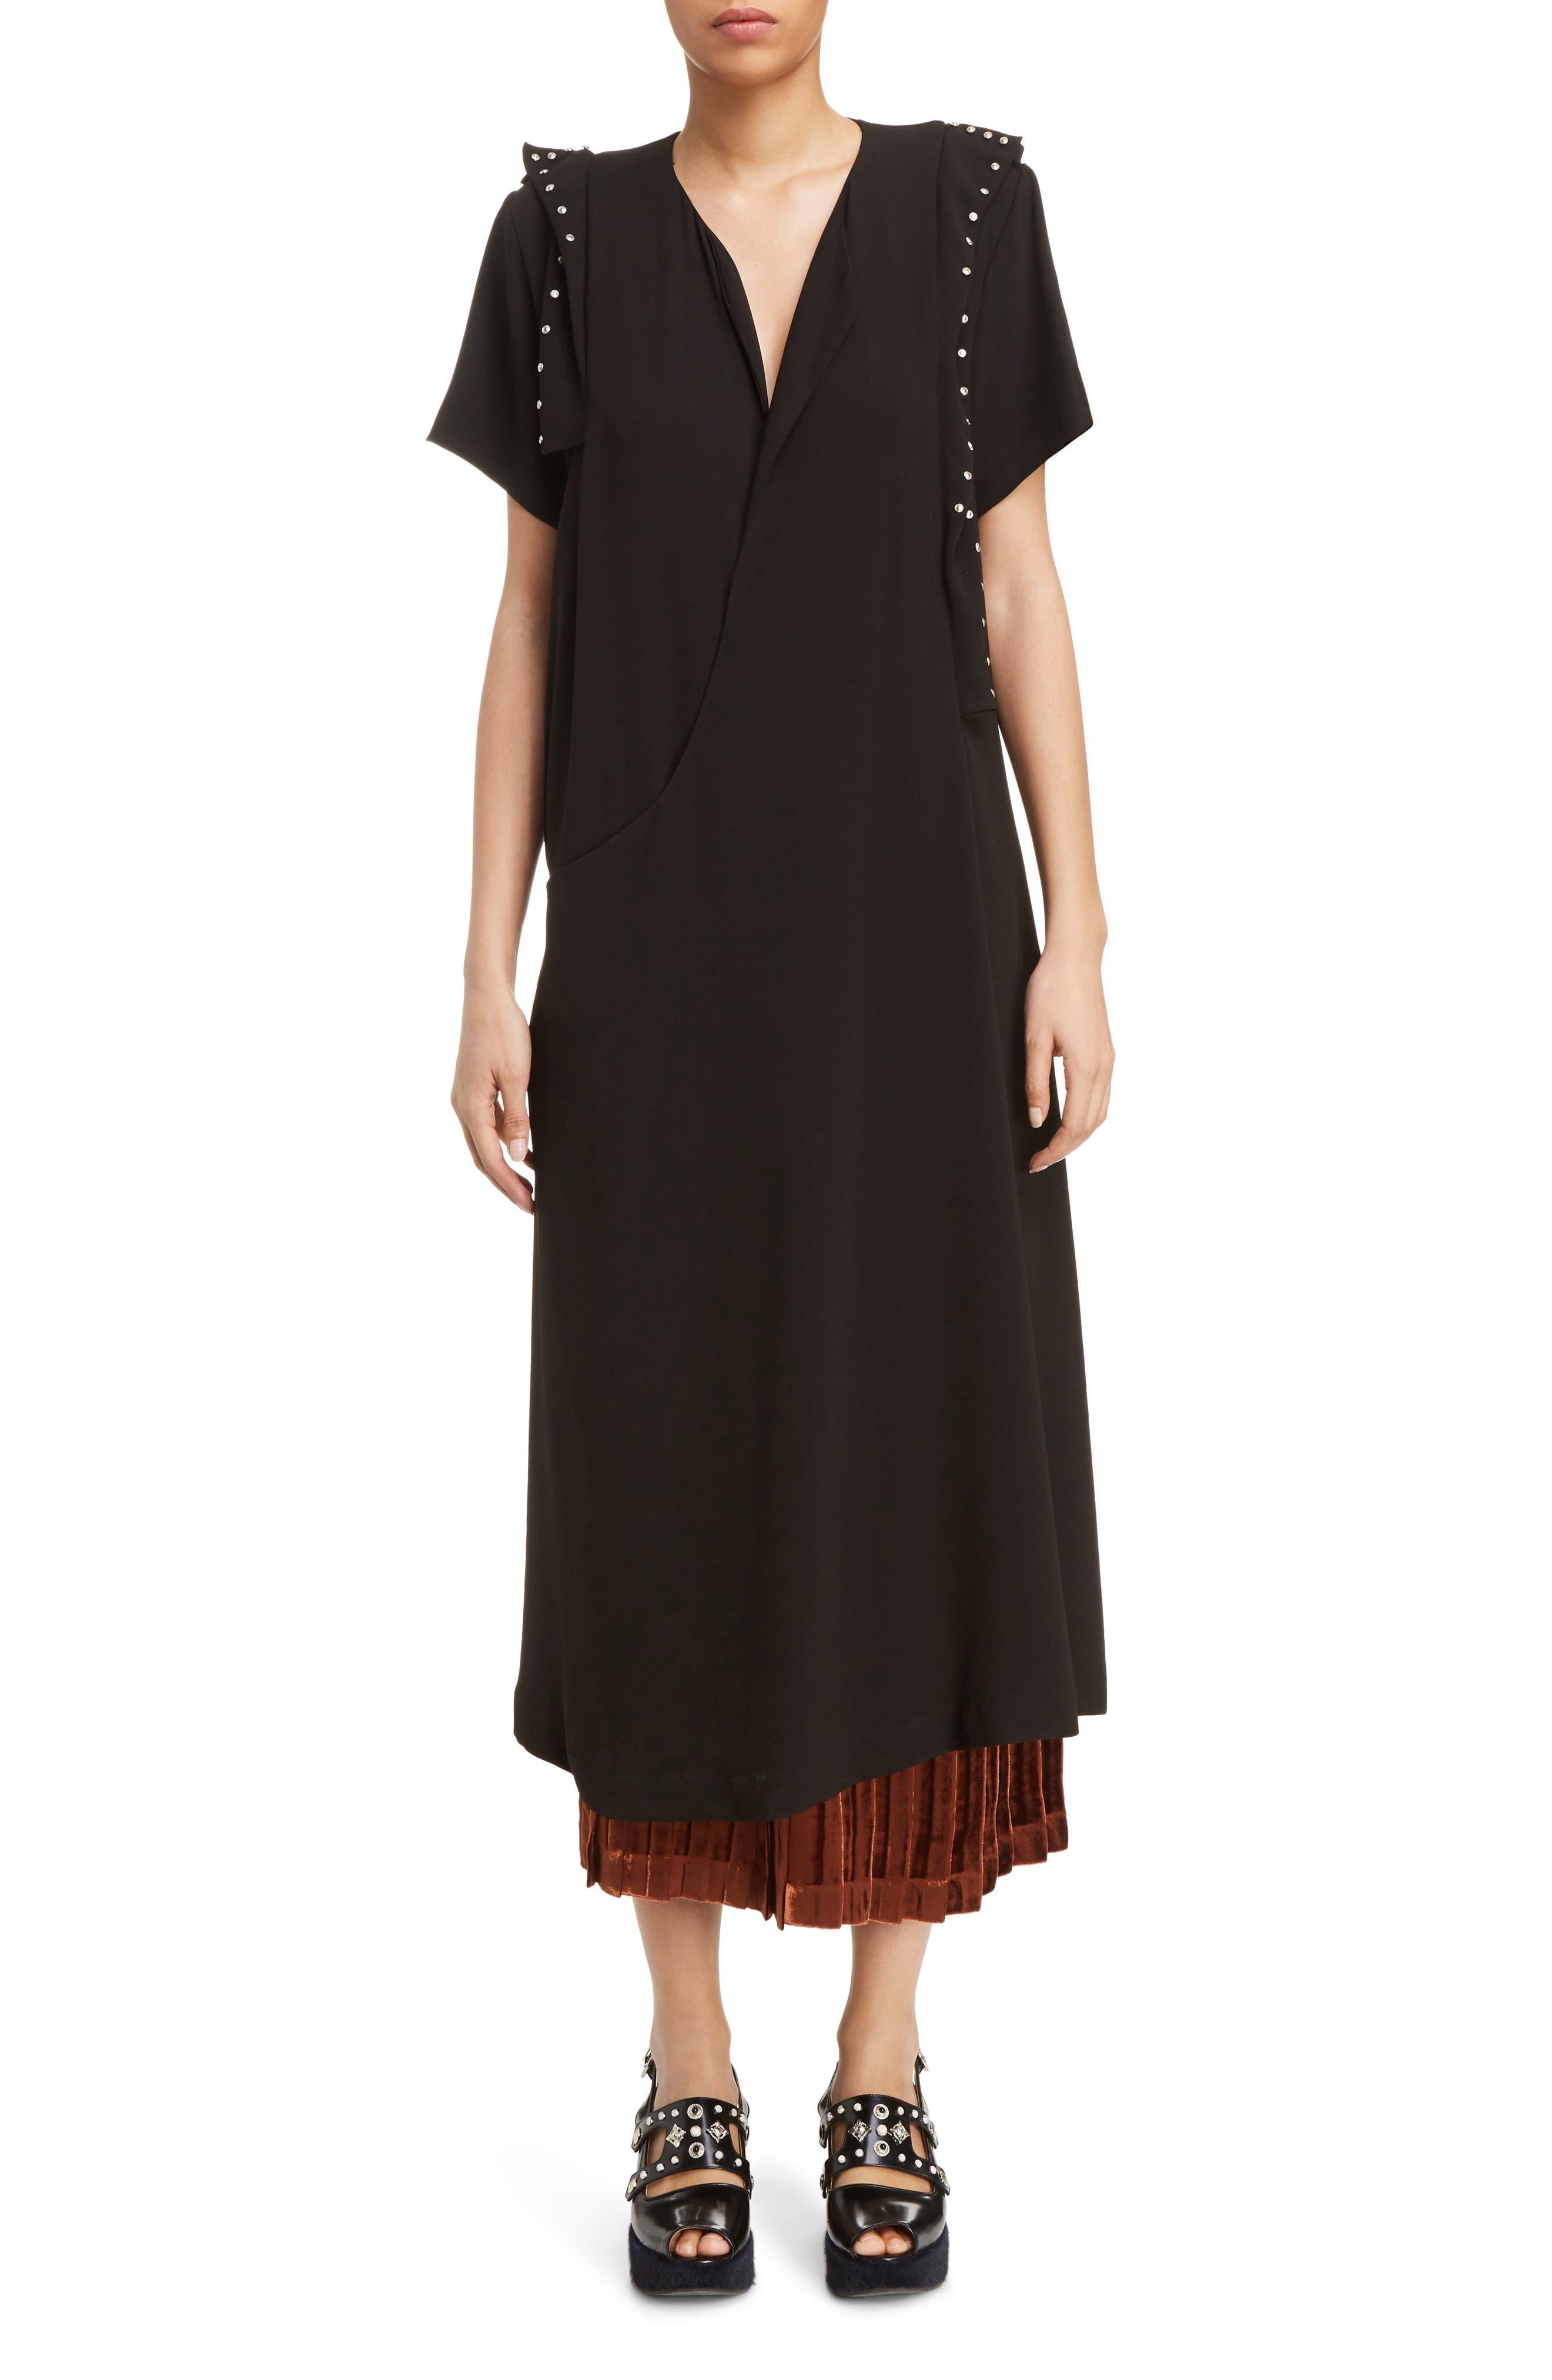 TOGA Georgette Faux Wrap Dress